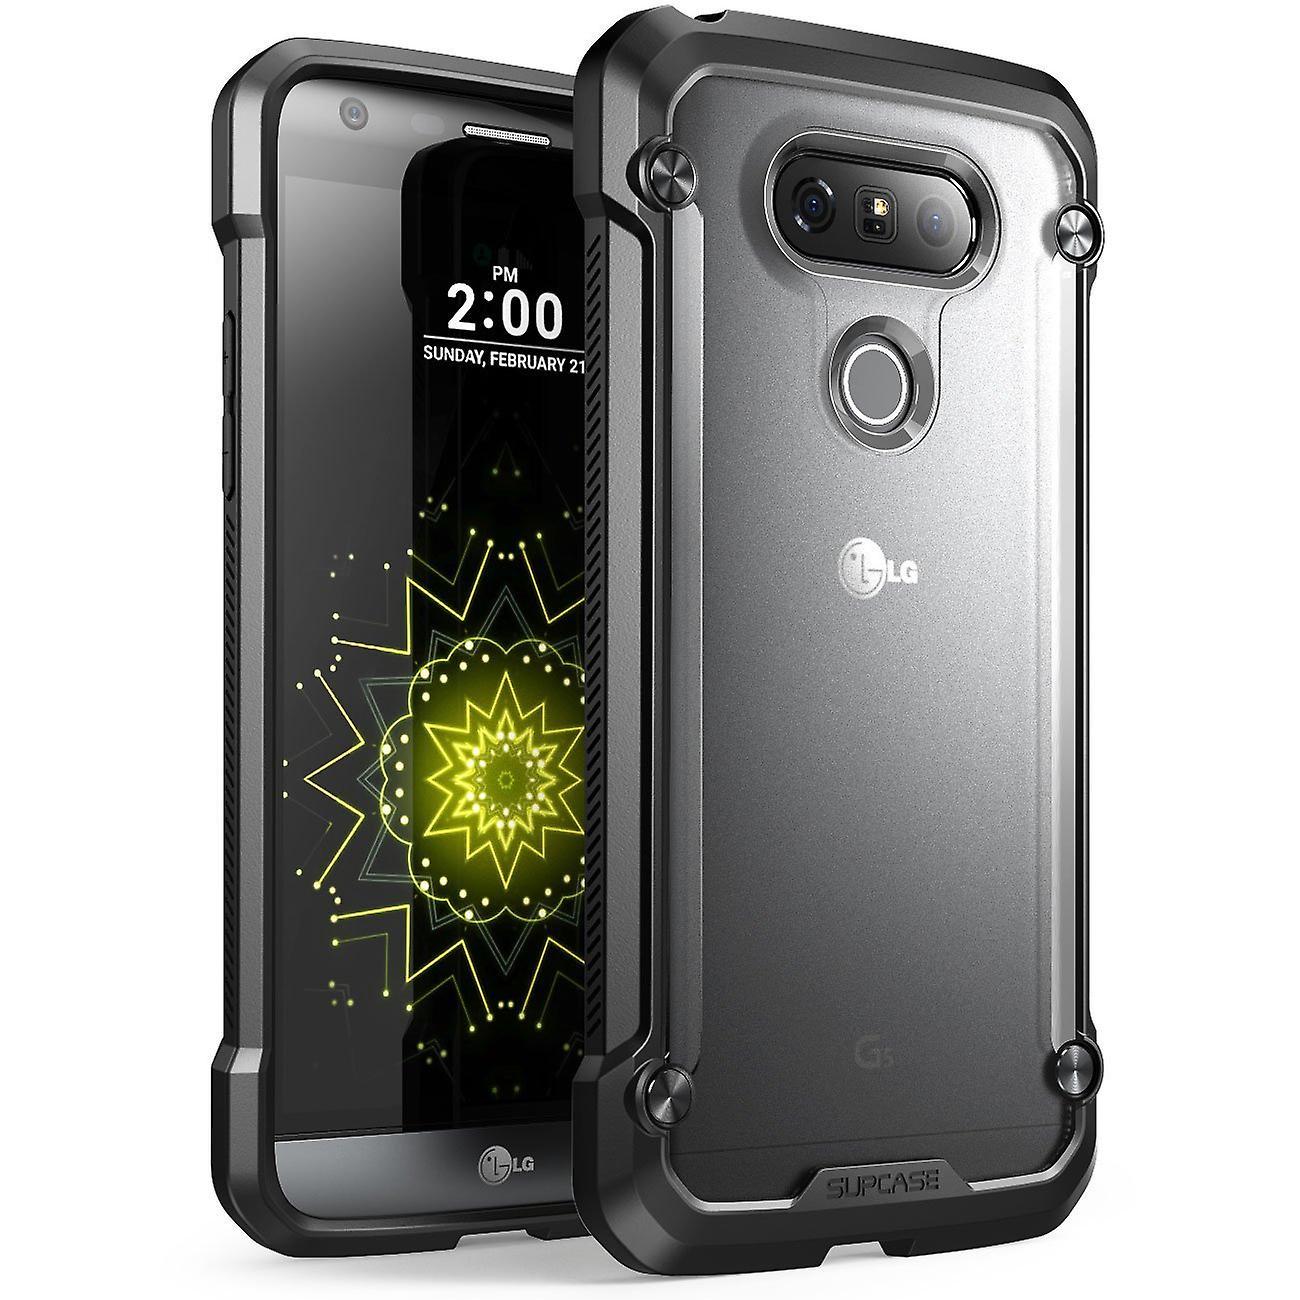 SUPCASE-Samsung LG G5 Unicorn Beetle Series Hybrid Protective Case-Clear